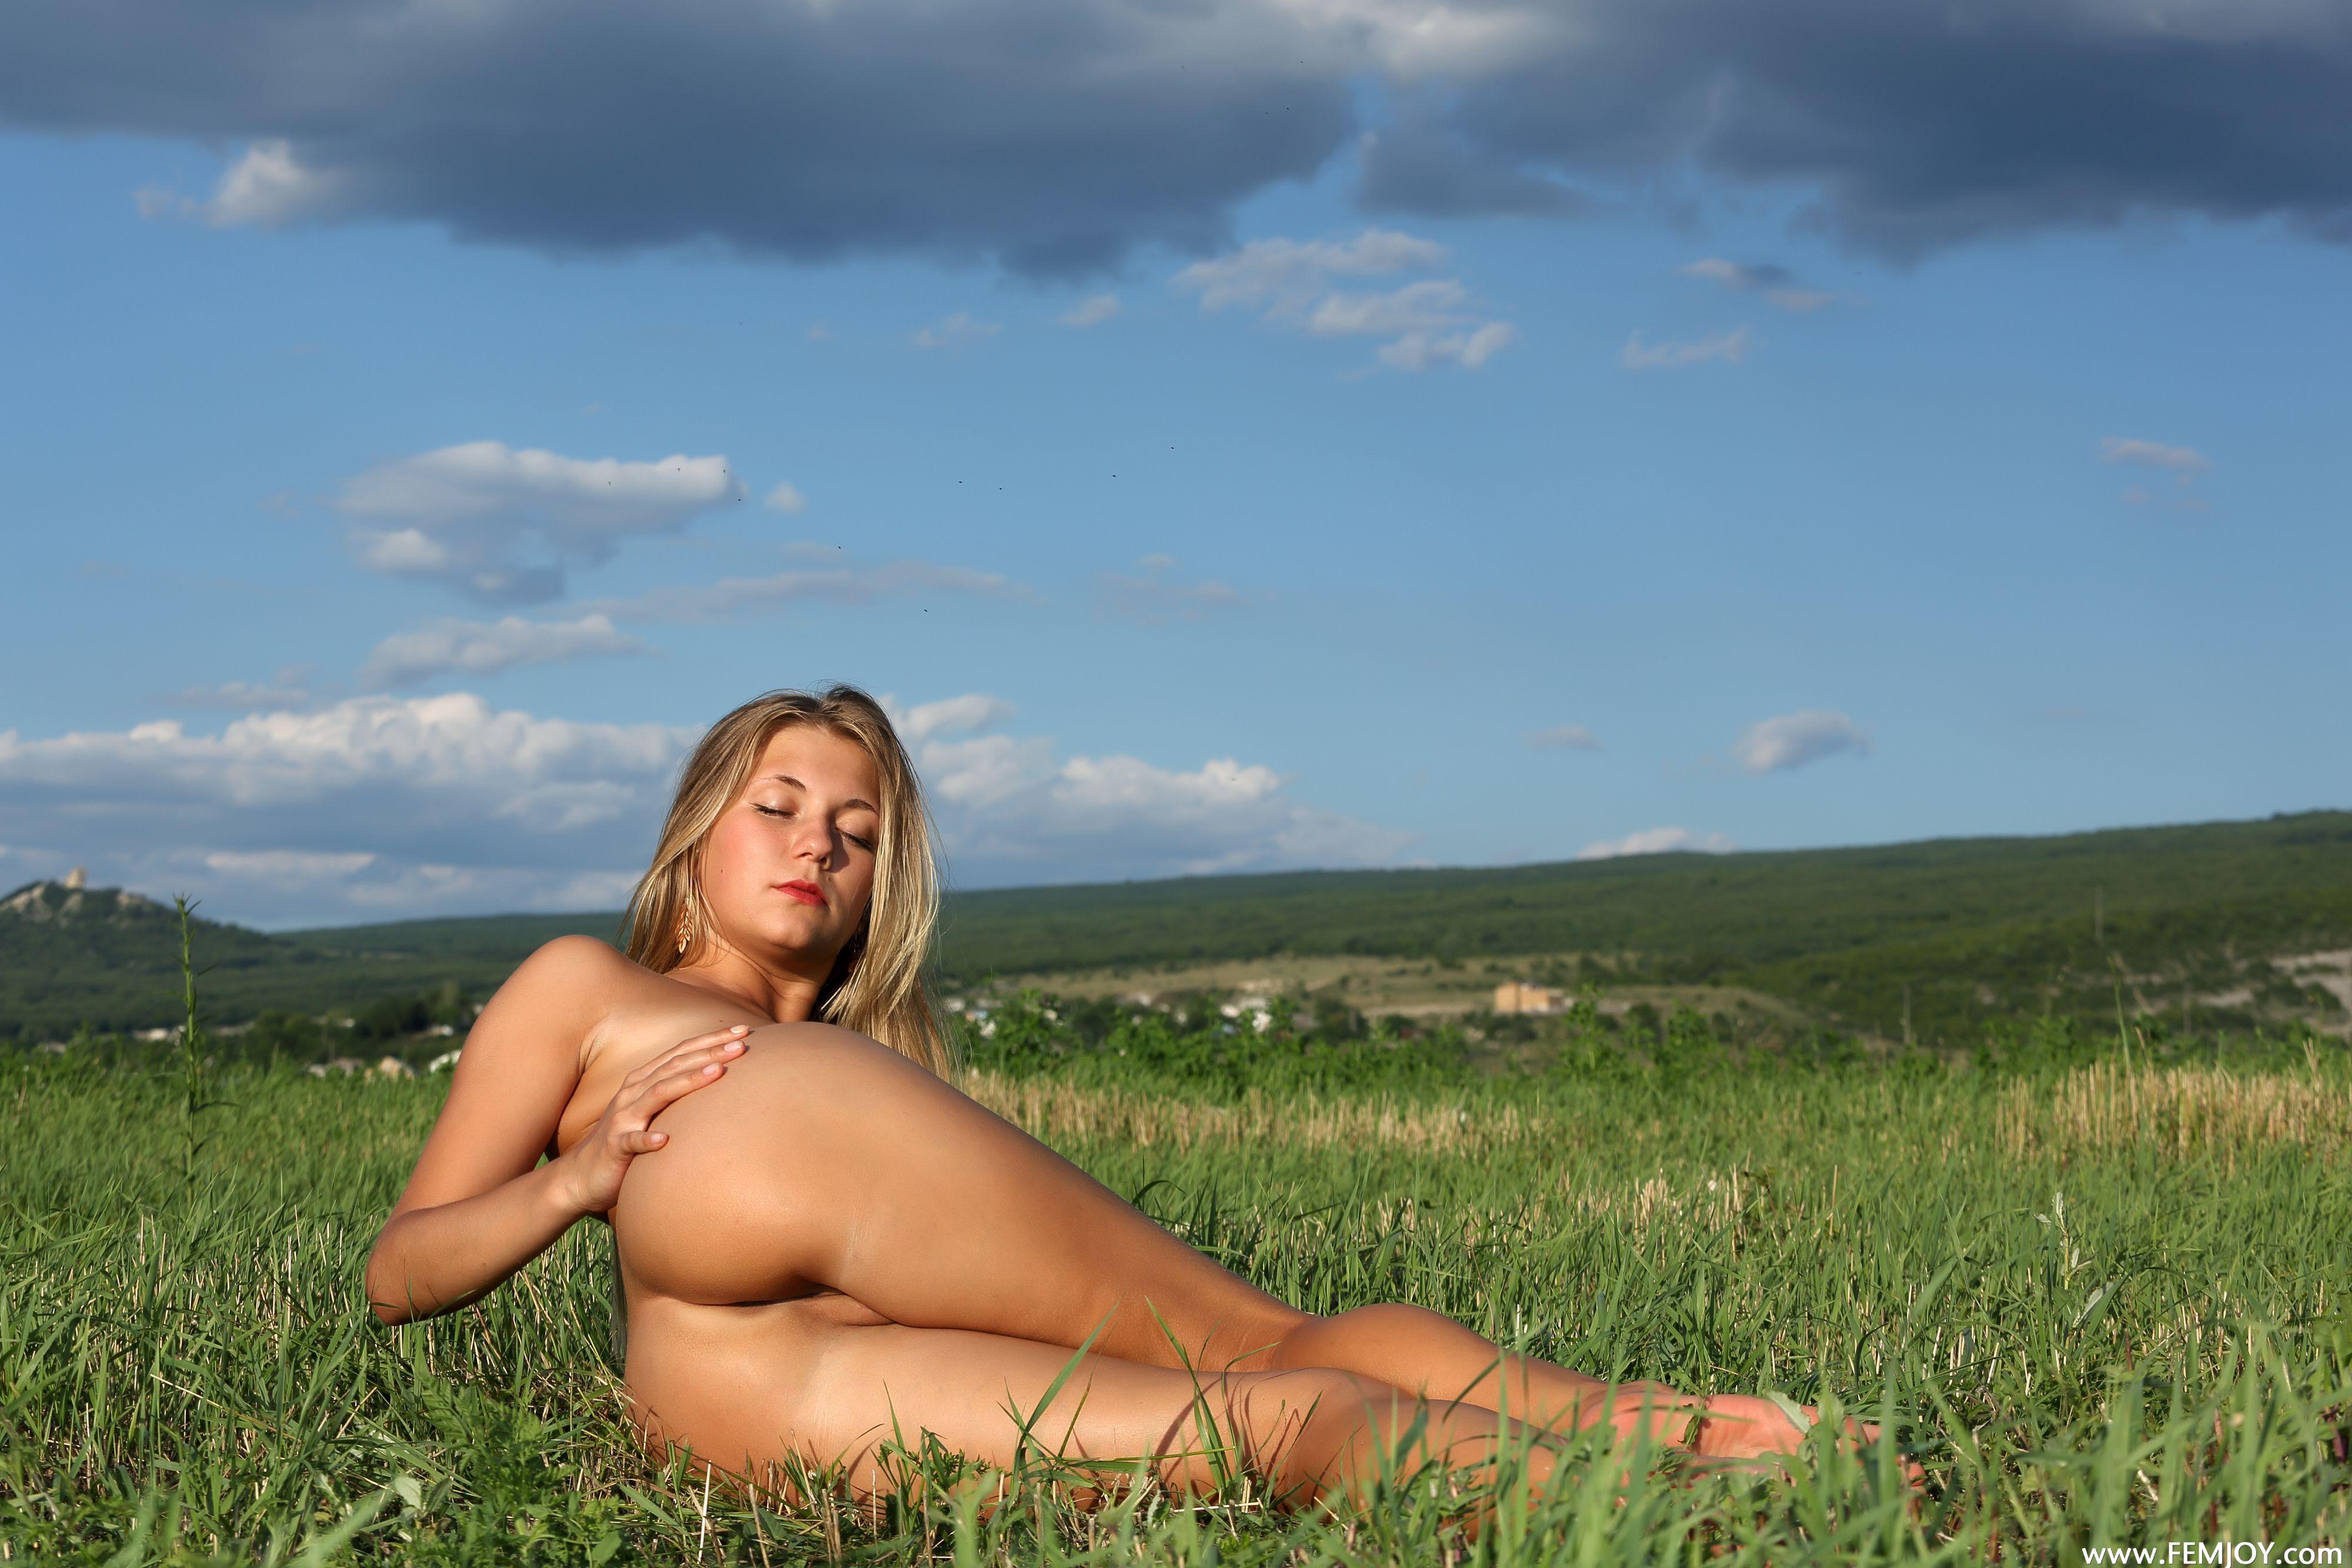 http://i5.imageban.ru/out/2013/11/13/2e51696cc12ac6b49610c056aa84932e.jpg